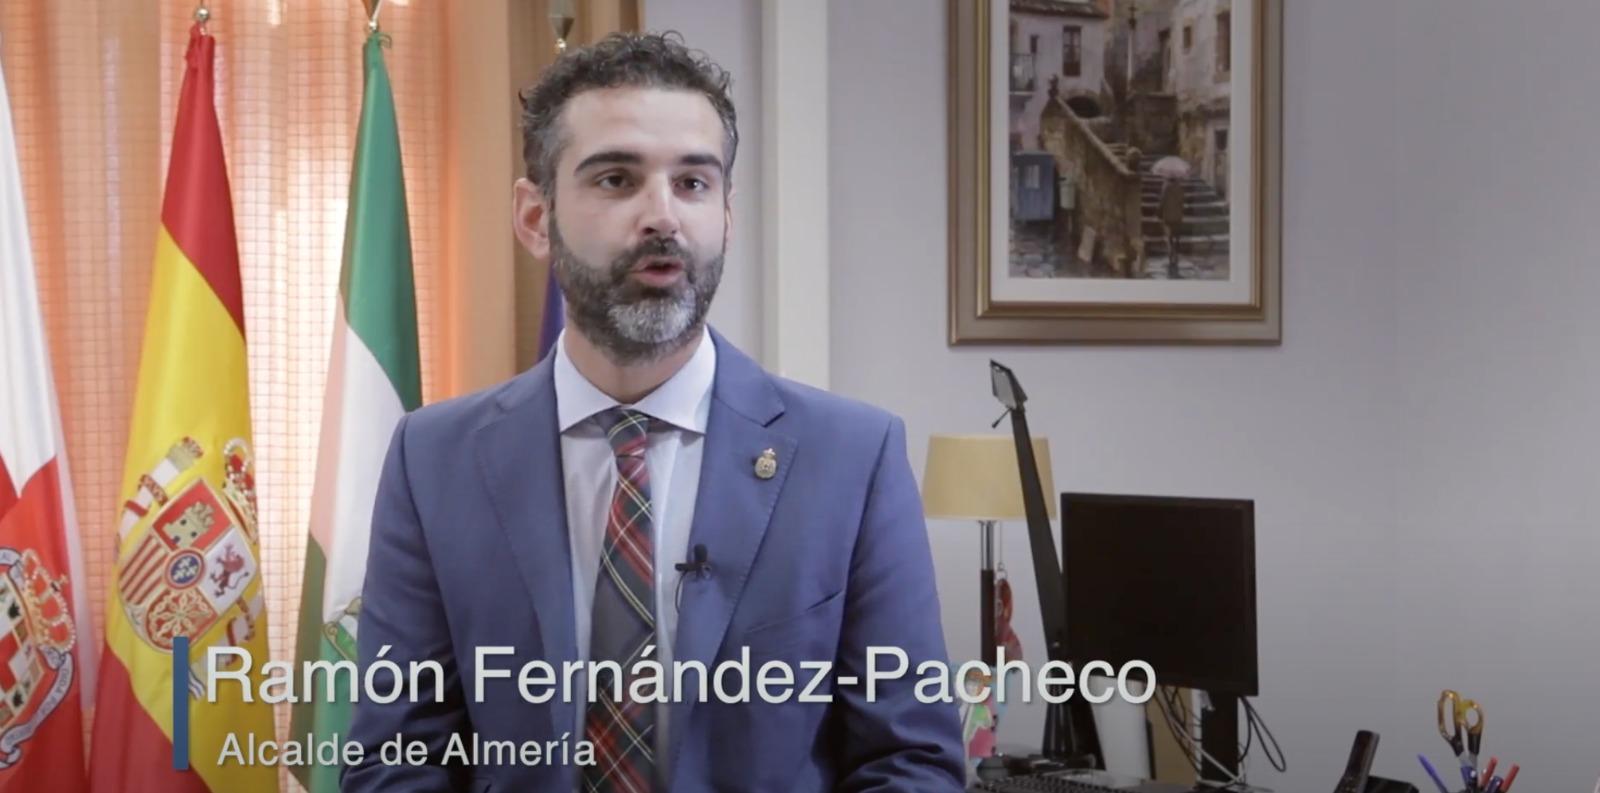 Ramón Fernández-Pacheco